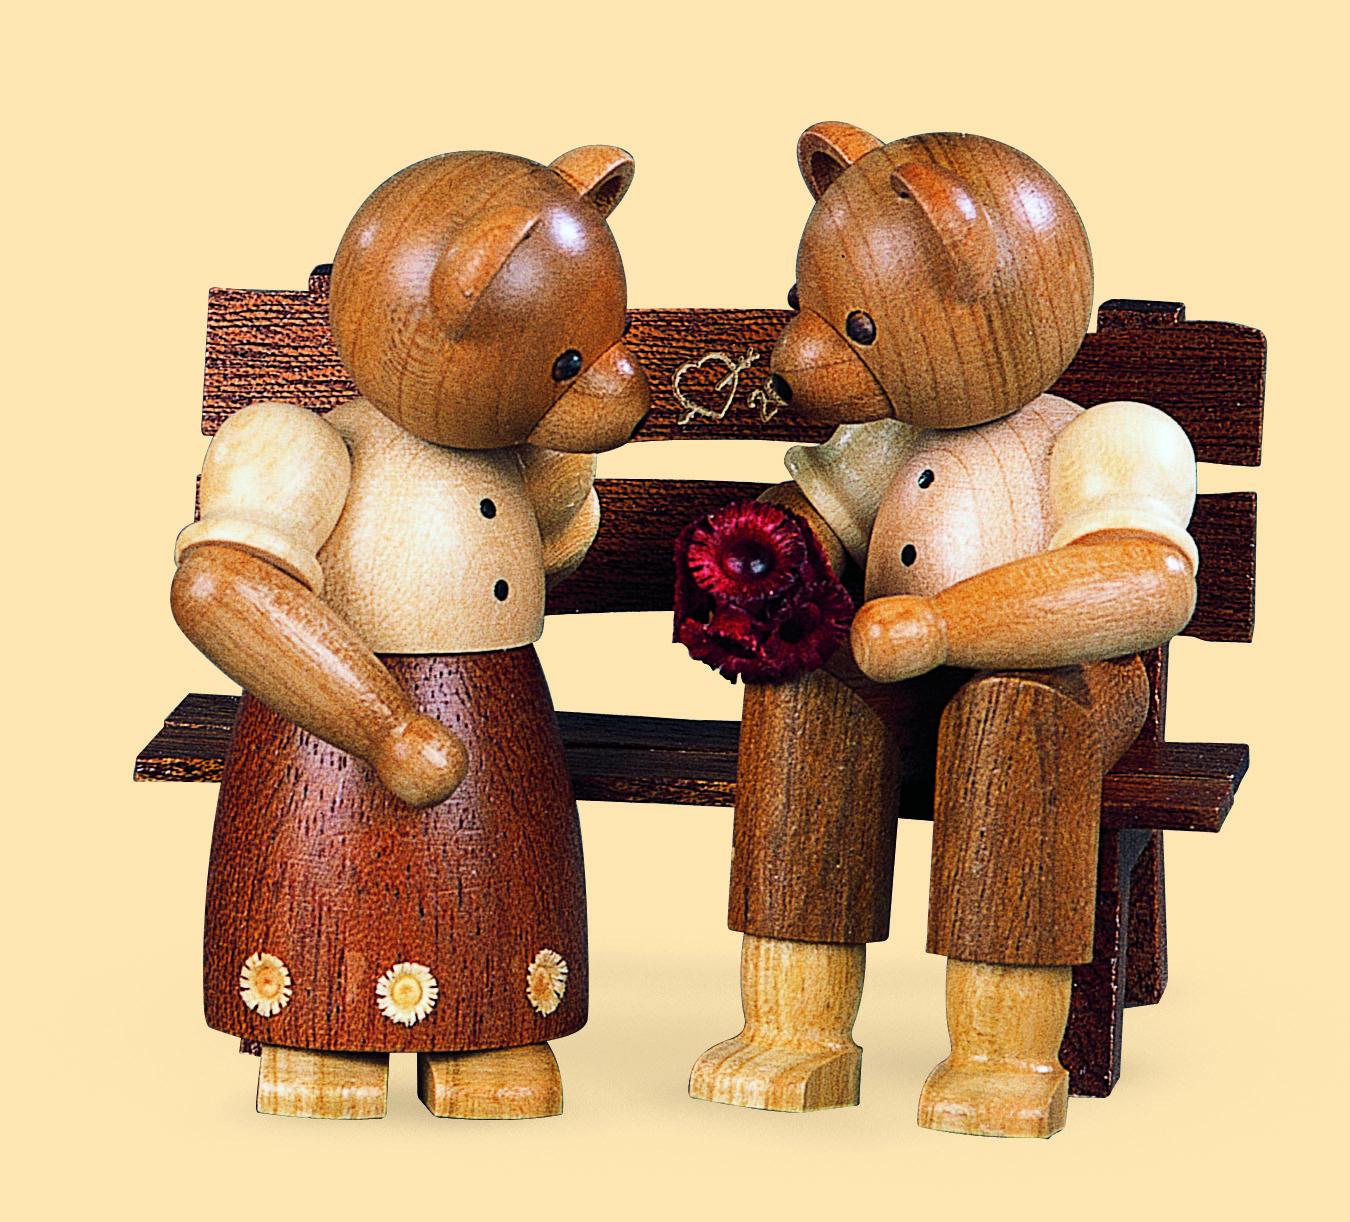 Bärenpaar auf Bank